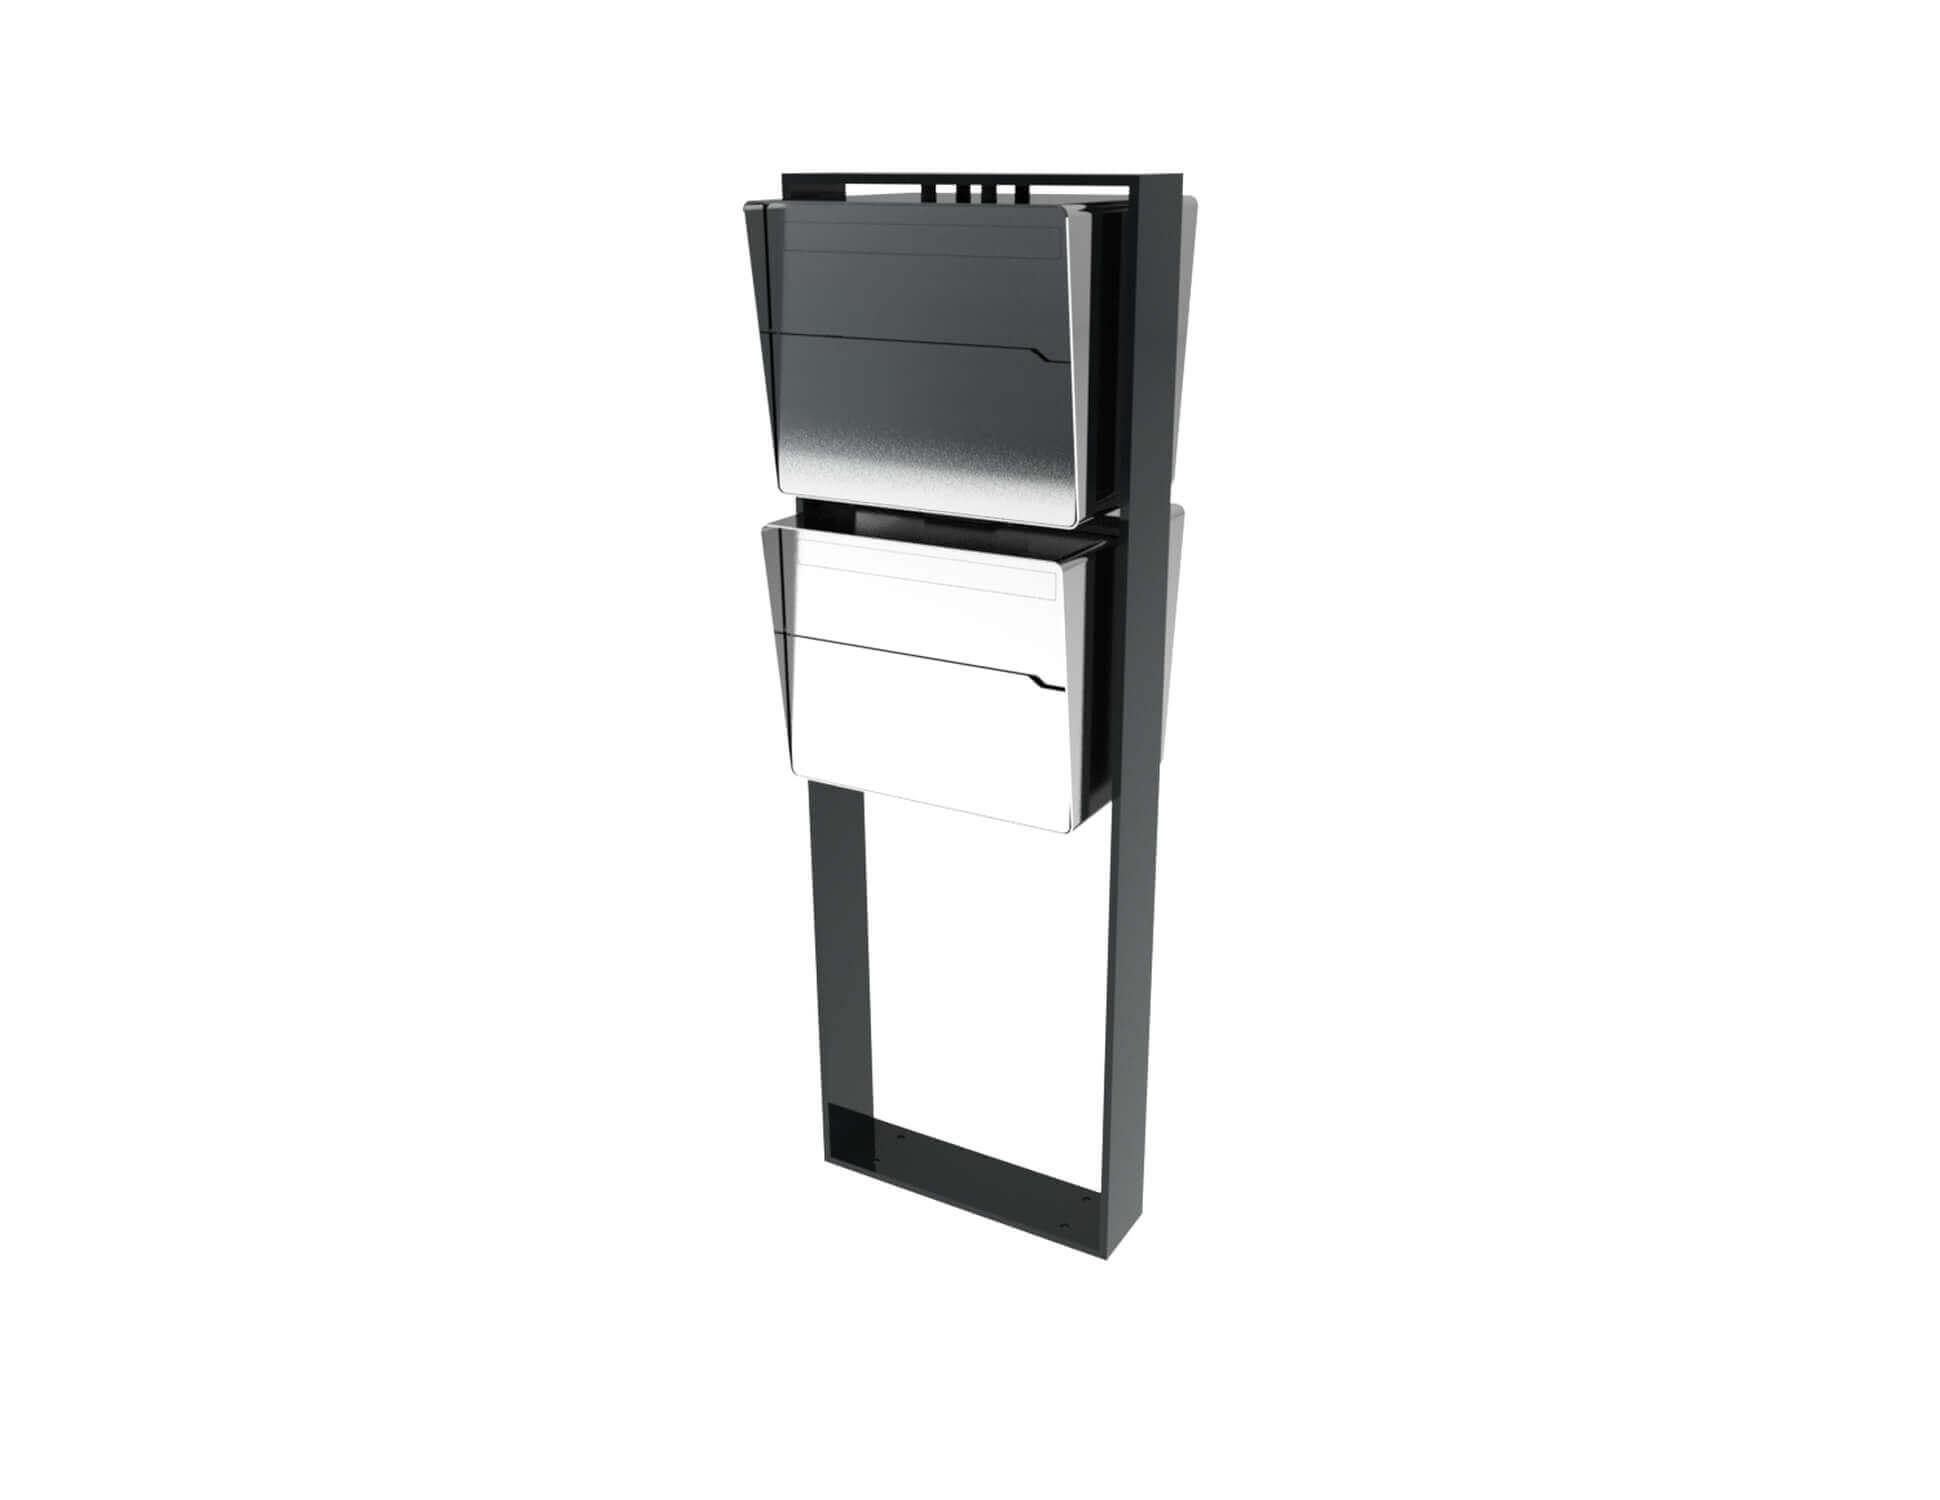 Freistehender moderner Briefkastenanlage Edelstahl Bellus 2er Vertikal